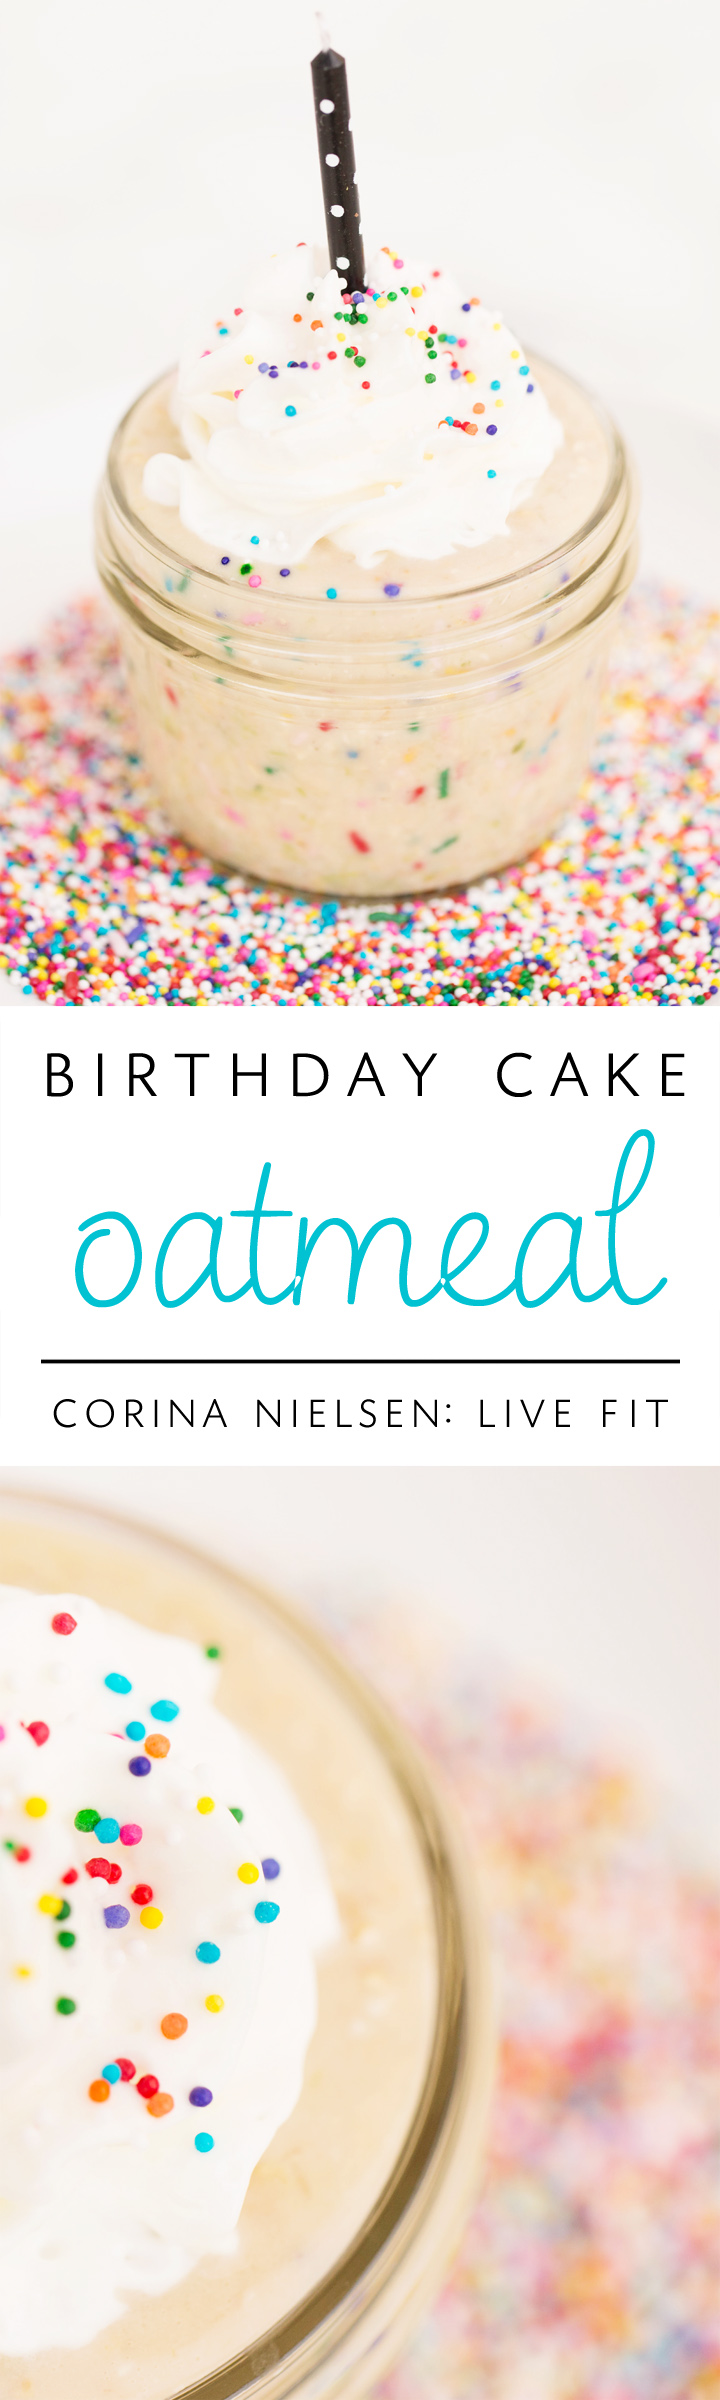 Cake Batter Oats Corina Nielsen Live Fit